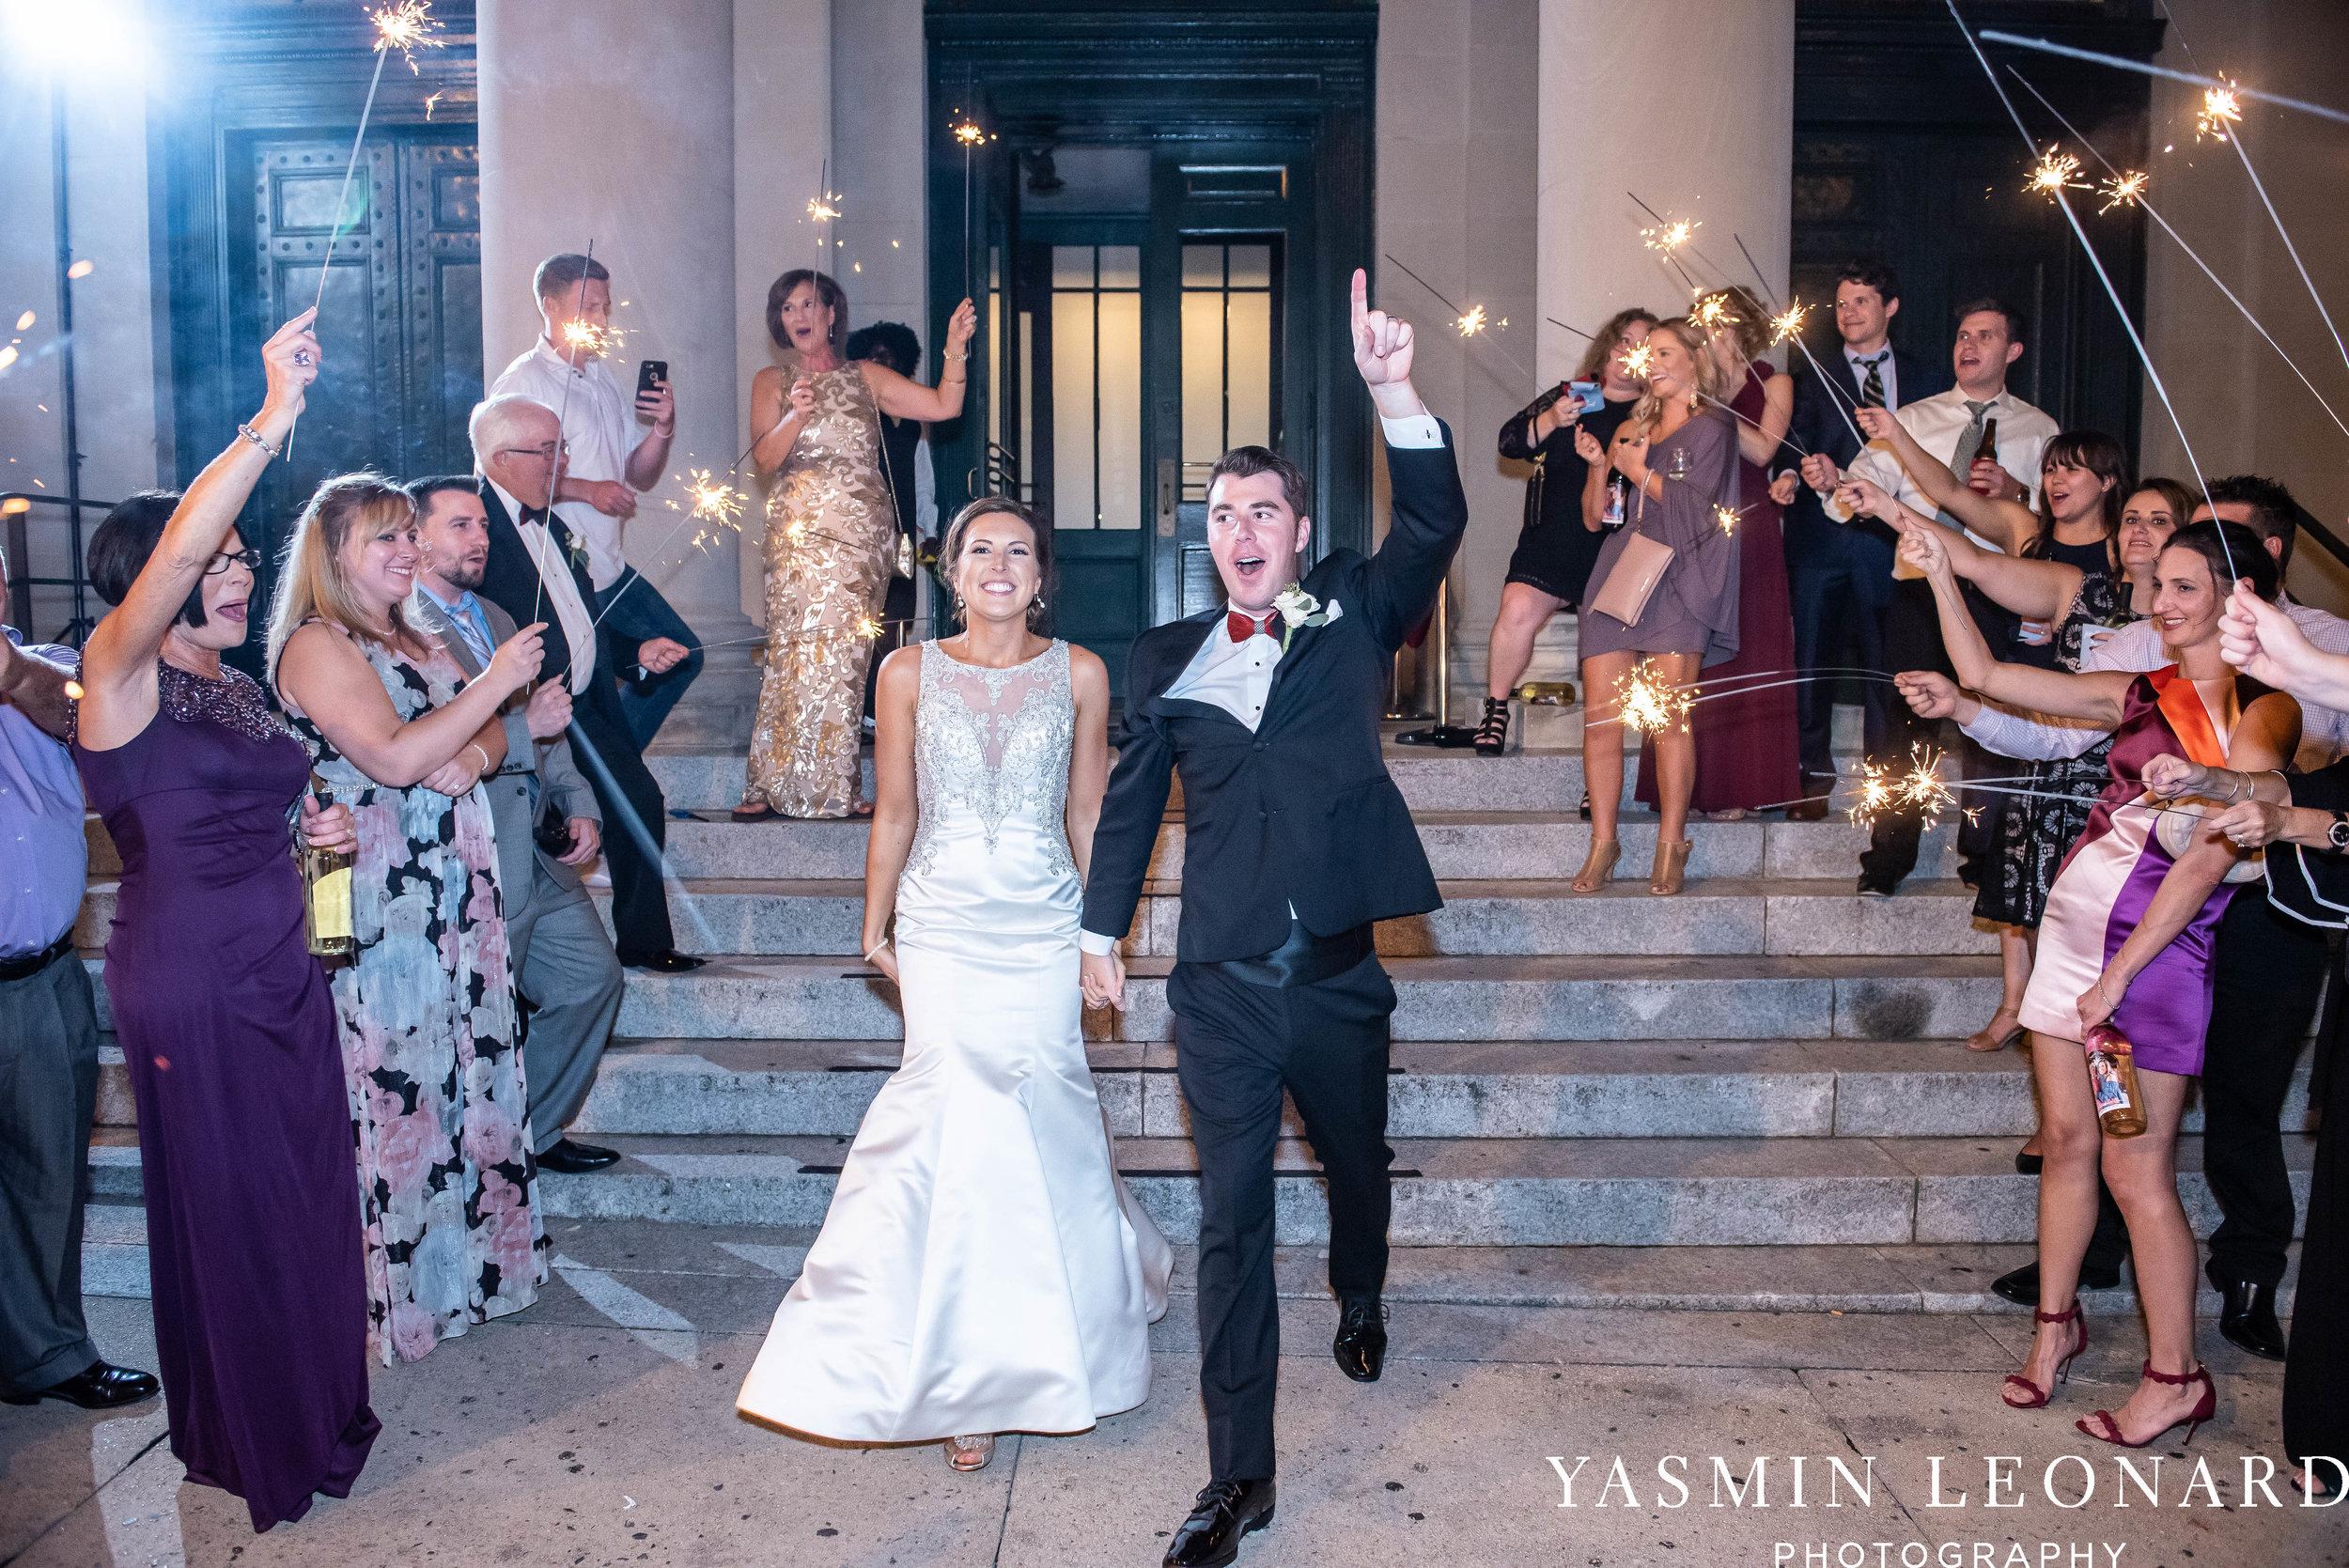 Millennium Center Wedding - Downtown Winston Salem - Winston Salem Wedding Photographer - Winston Salem Venues - Indoor Wedding Venues - NC Wedding Photographer - Yasmin Leonard Photography-87.jpg